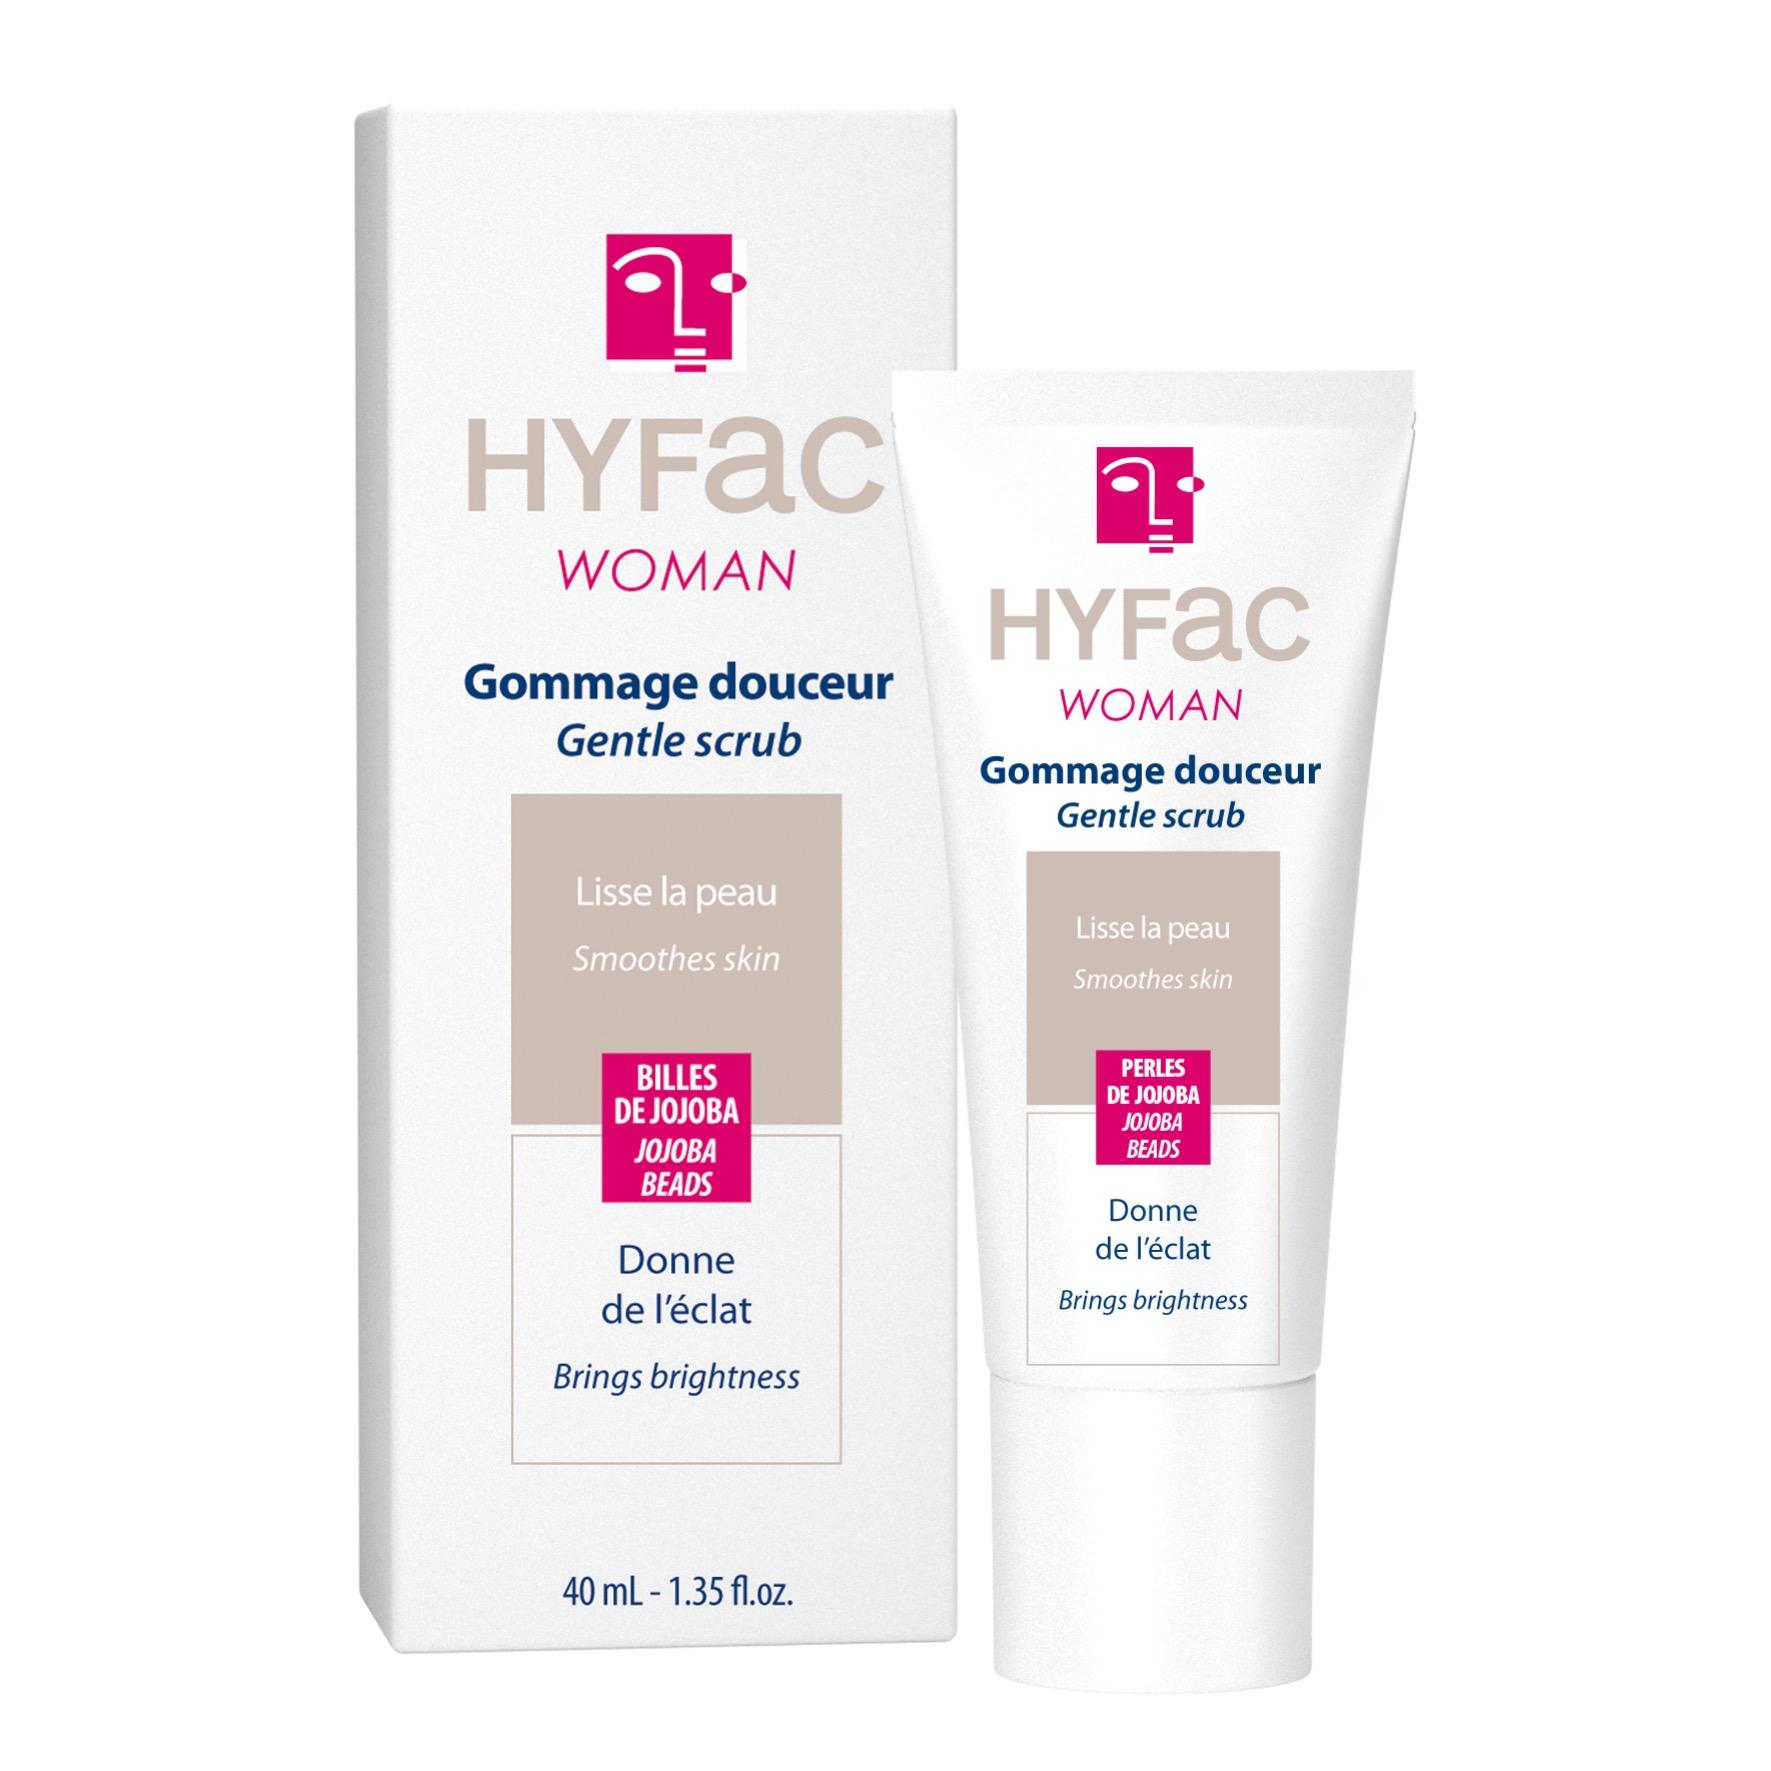 HYFAC WOMAN gommage douceur exfoliant